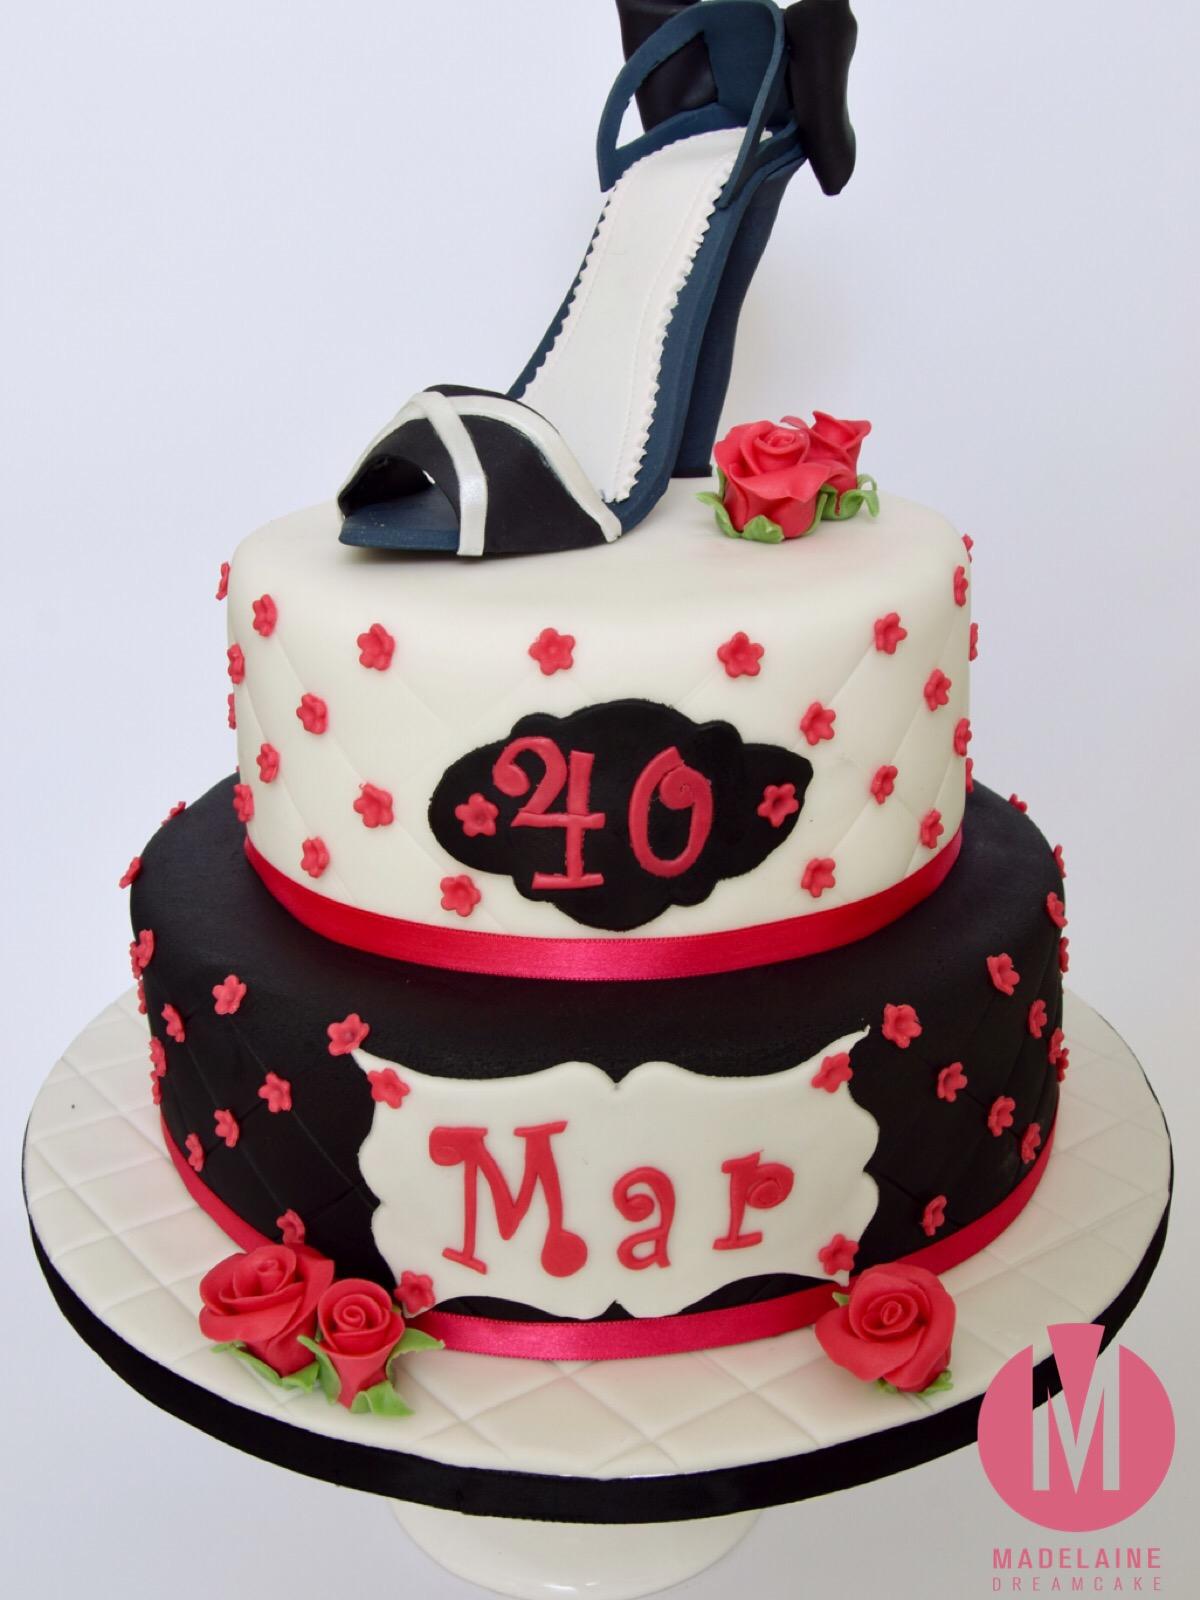 High Heels Torte Madelainedreamcake